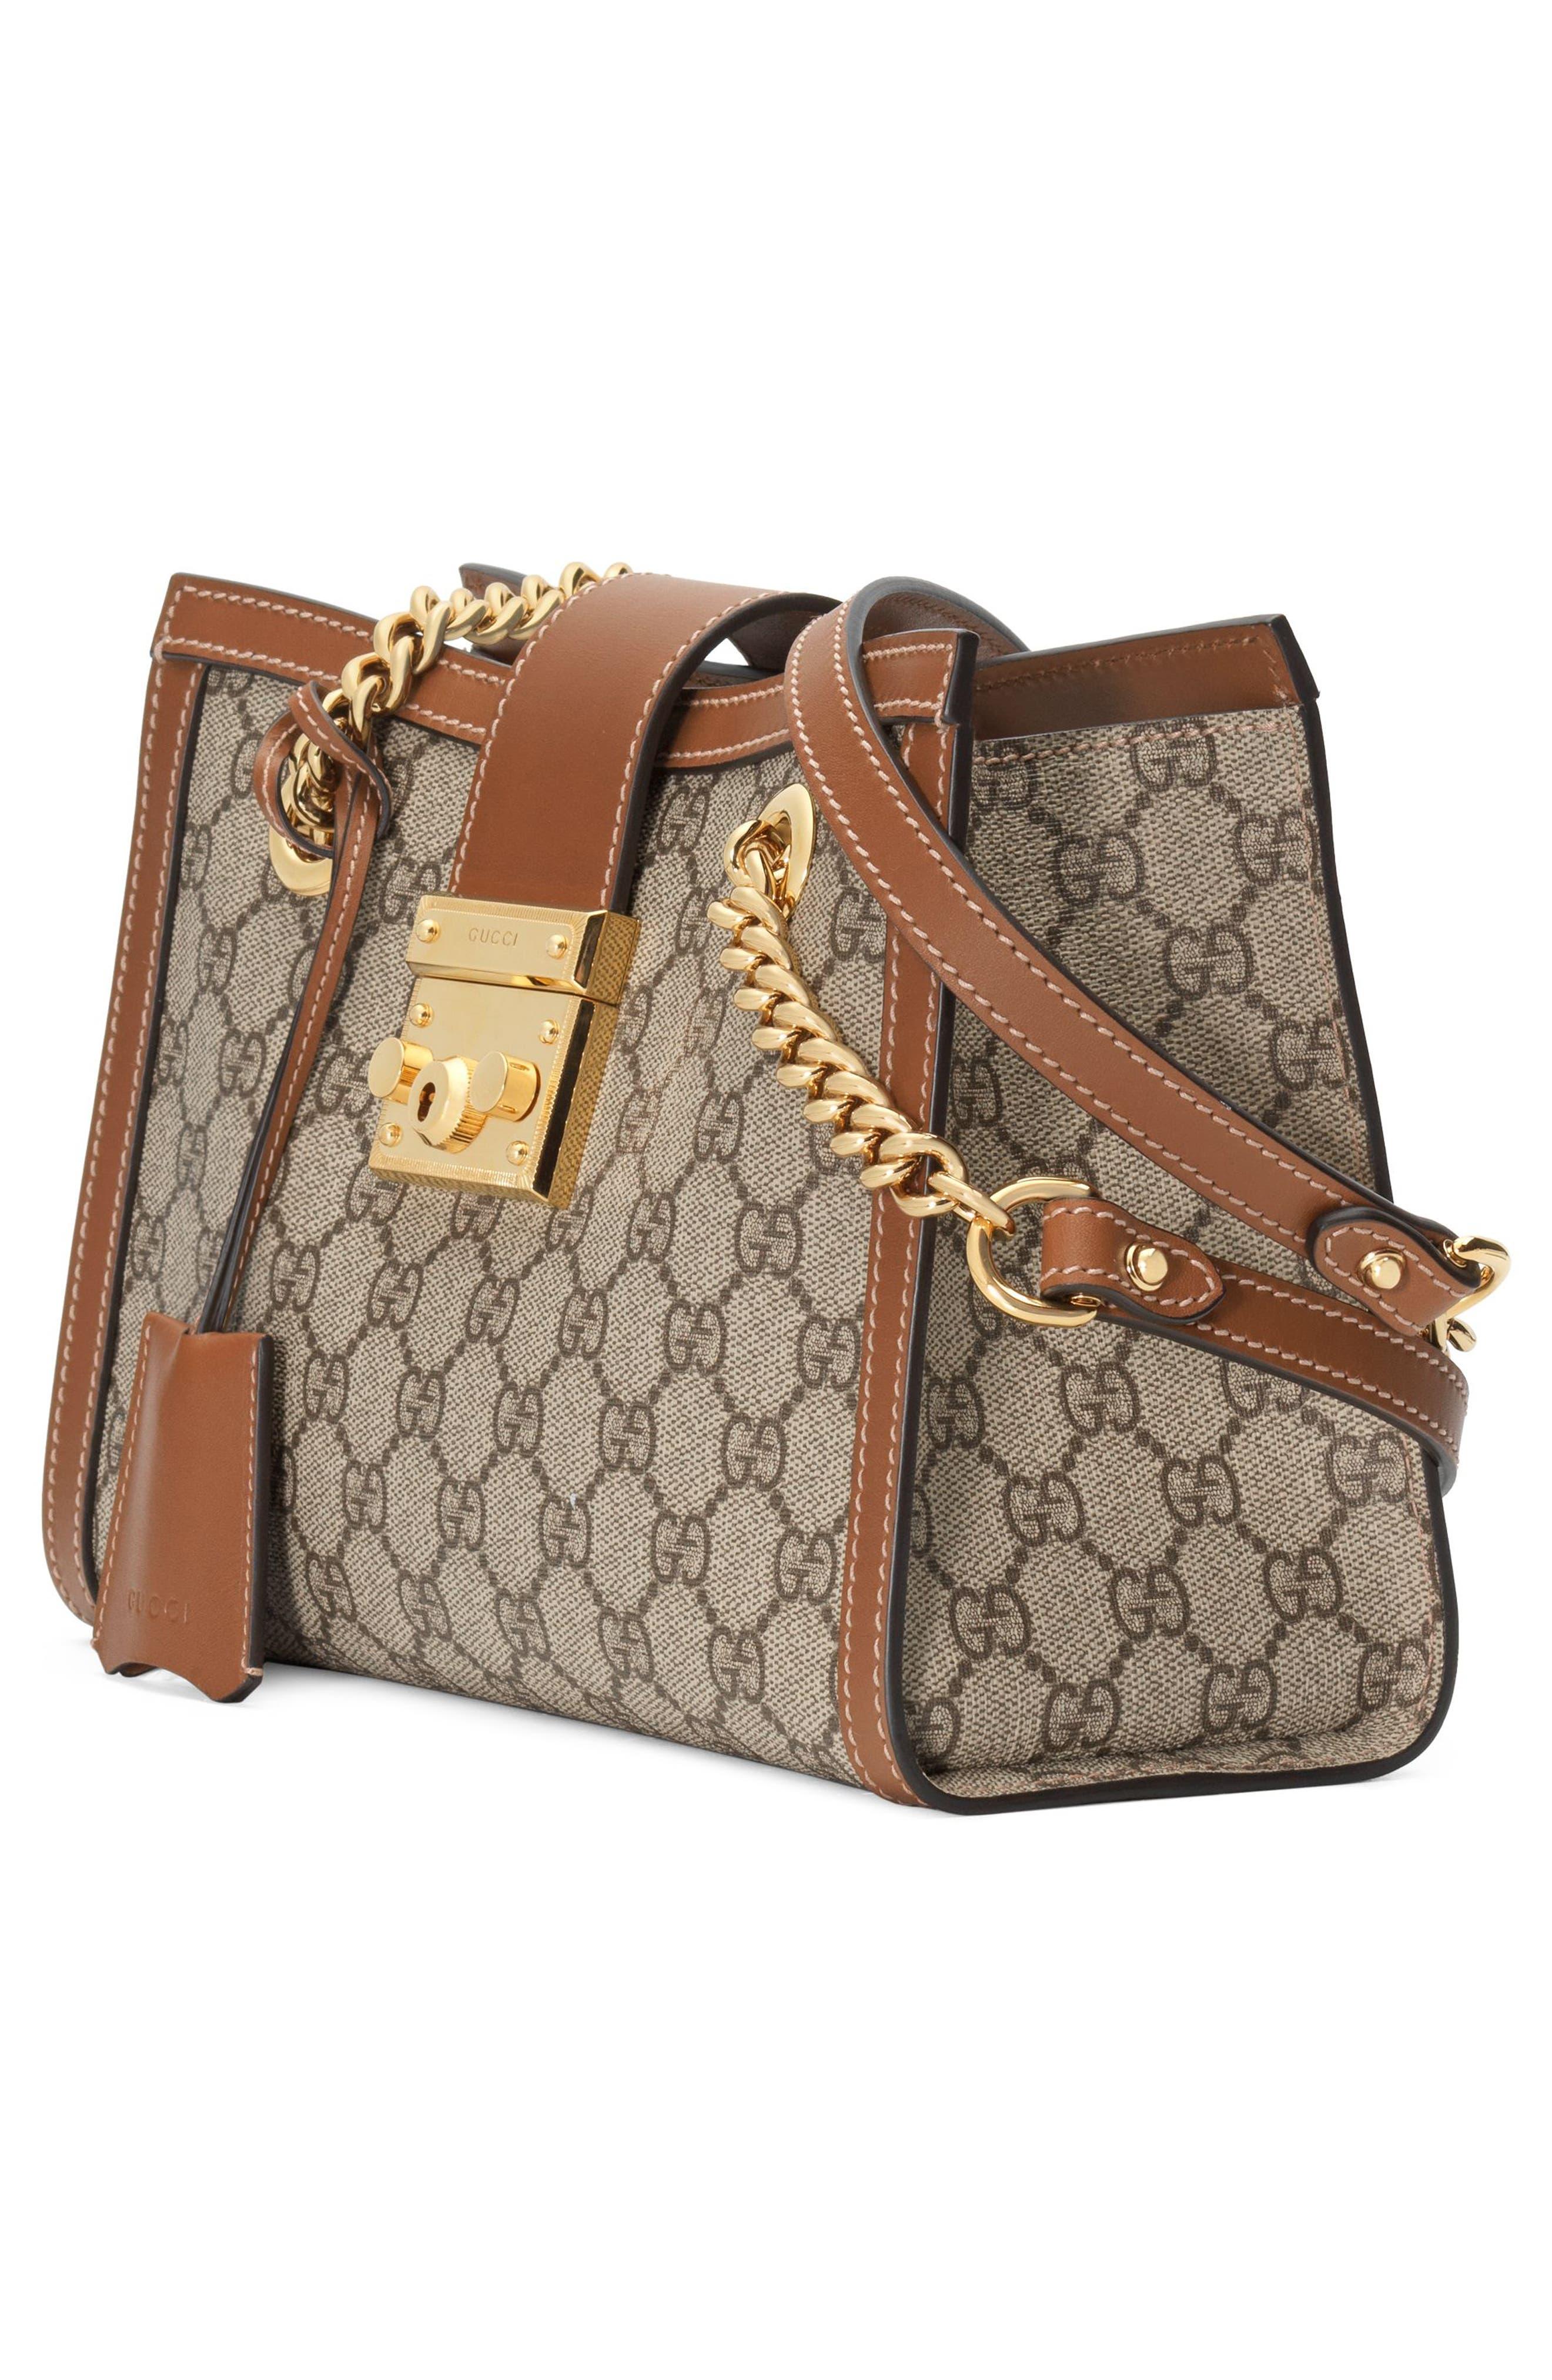 GUCCI, Small Padlock GG Supreme Shoulder Bag, Alternate thumbnail 4, color, BEIGE EBONY/ TUSCANY